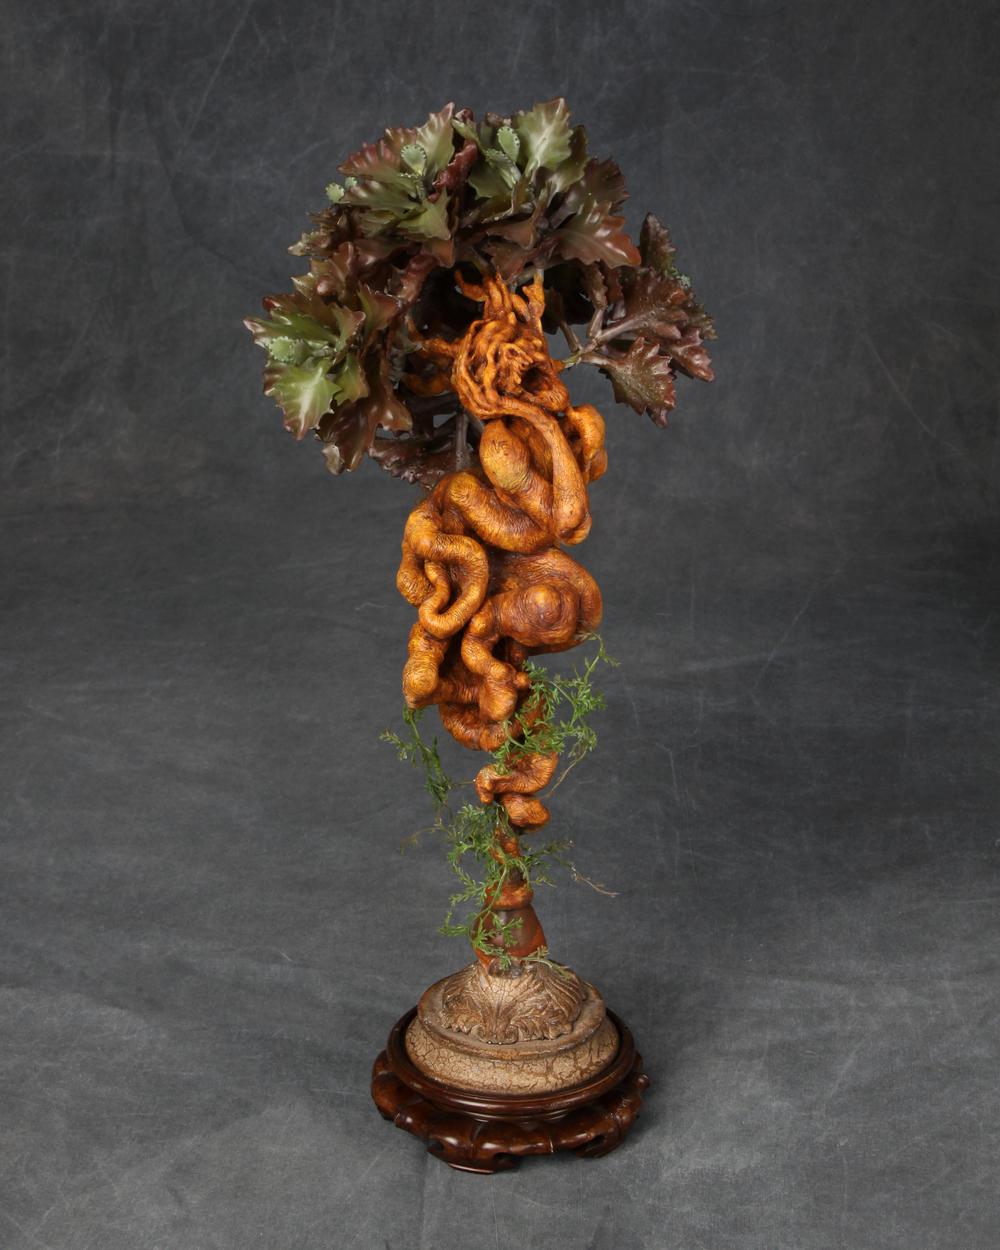 Mandrake Reliquary Artwork by Dan Chudzinski